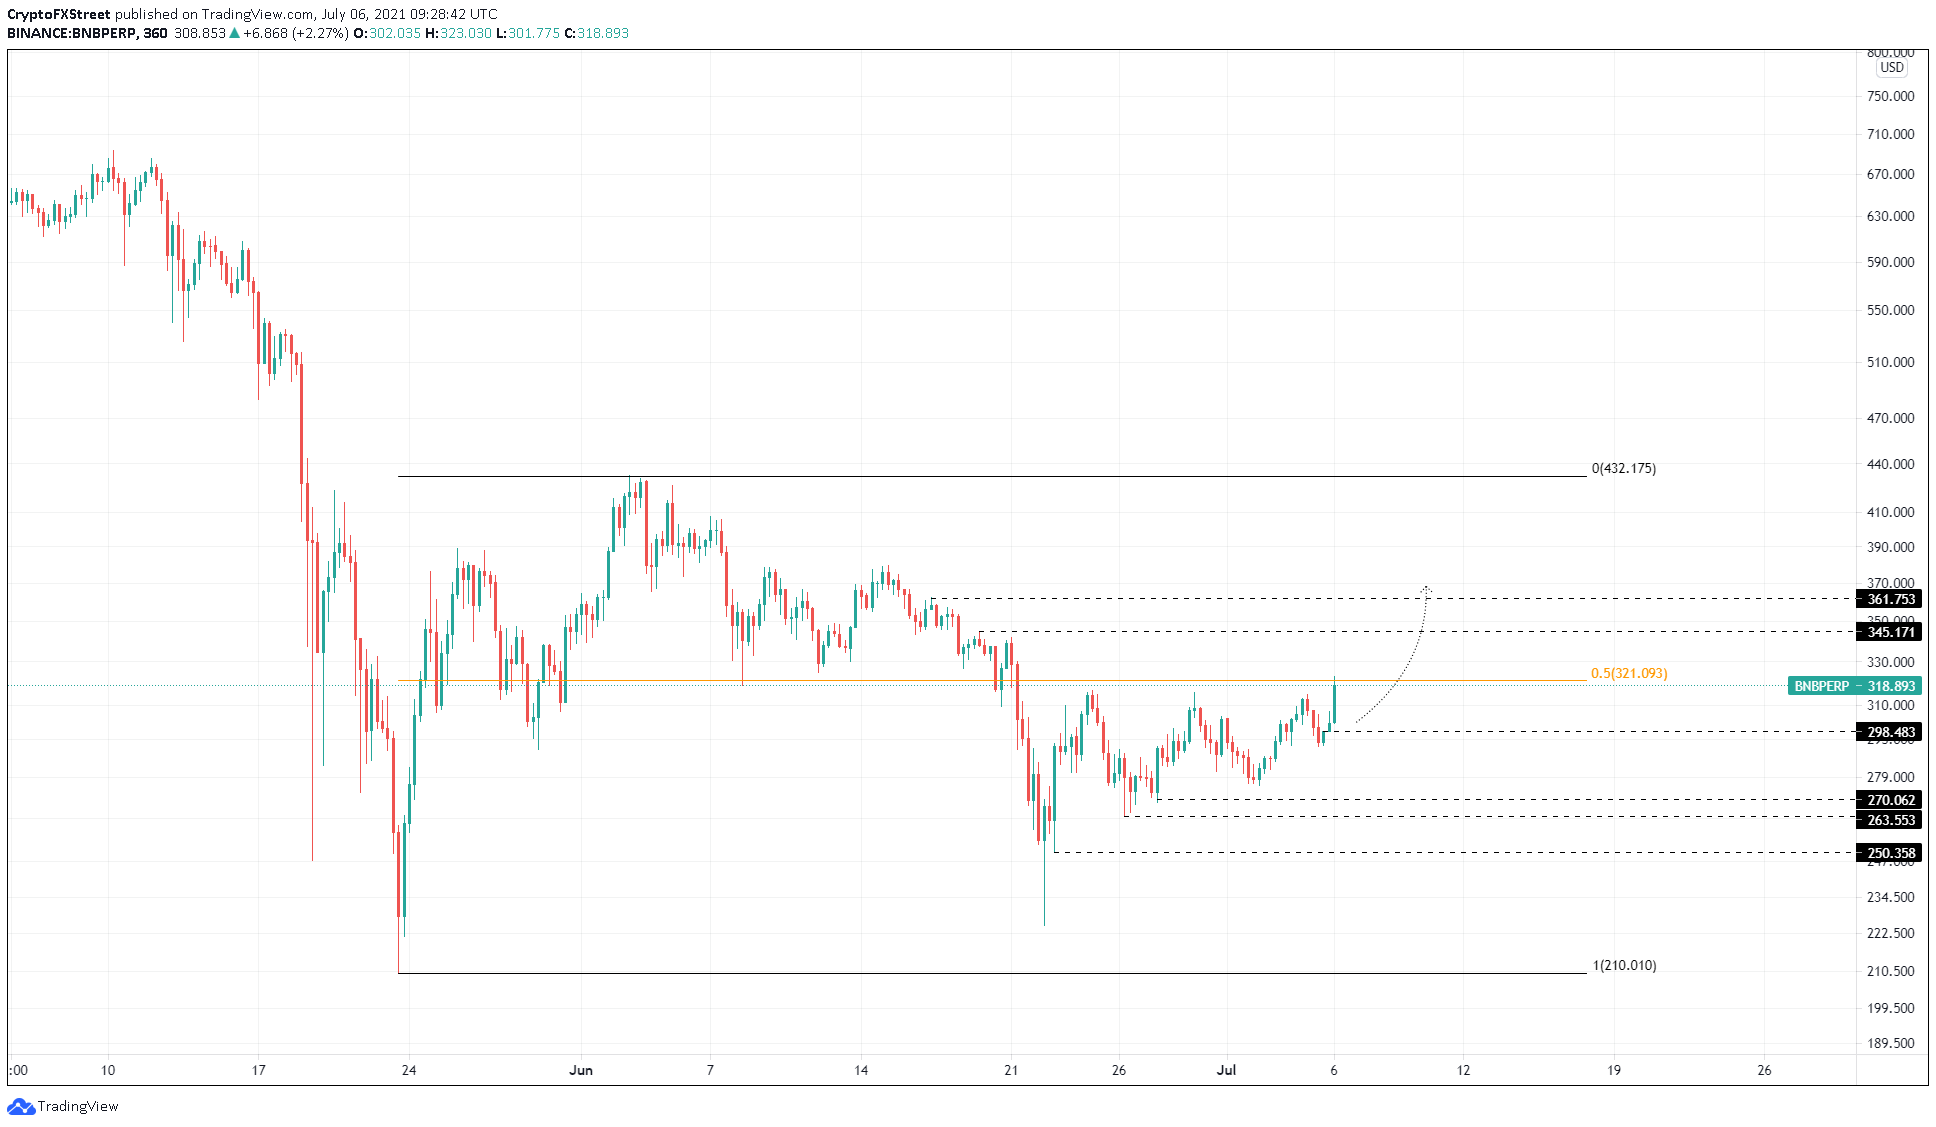 BNB/USDT 4-hour chart